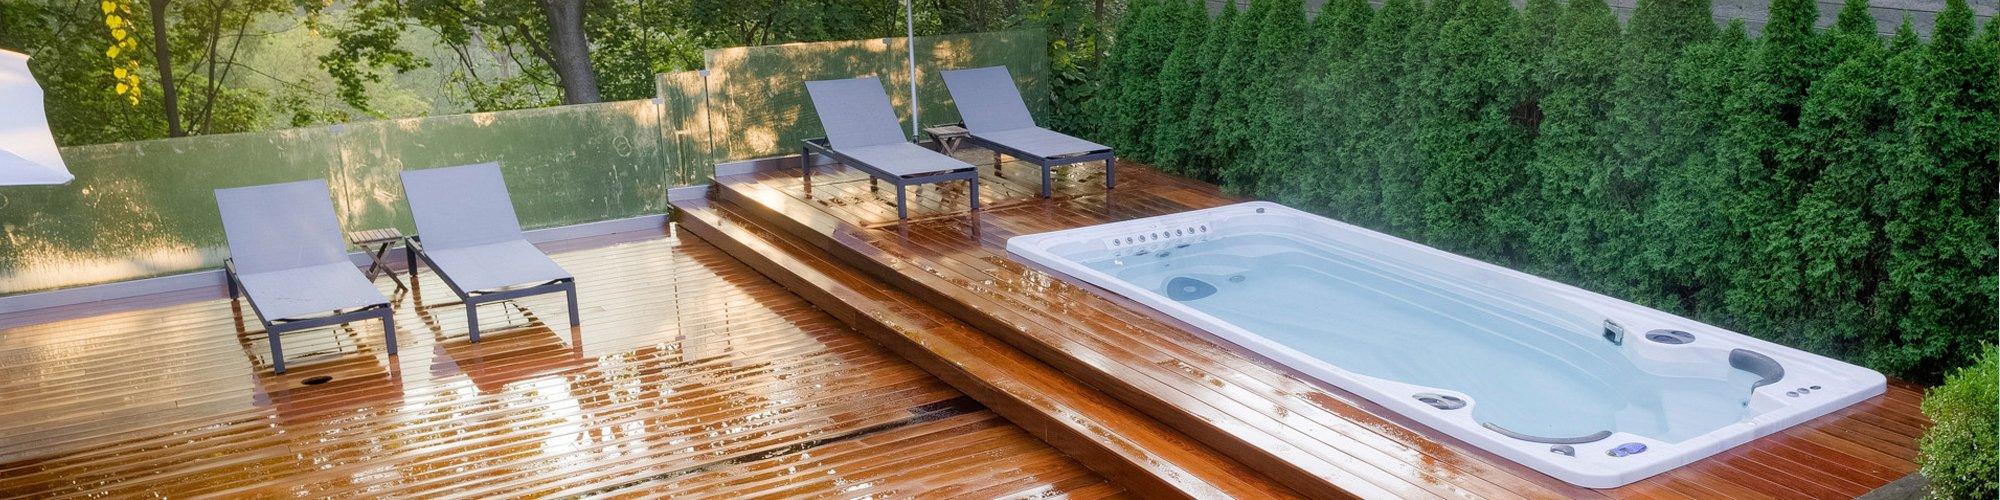 hydropool-a-spot-3-1 - Maximum Comfort Pool & Spa